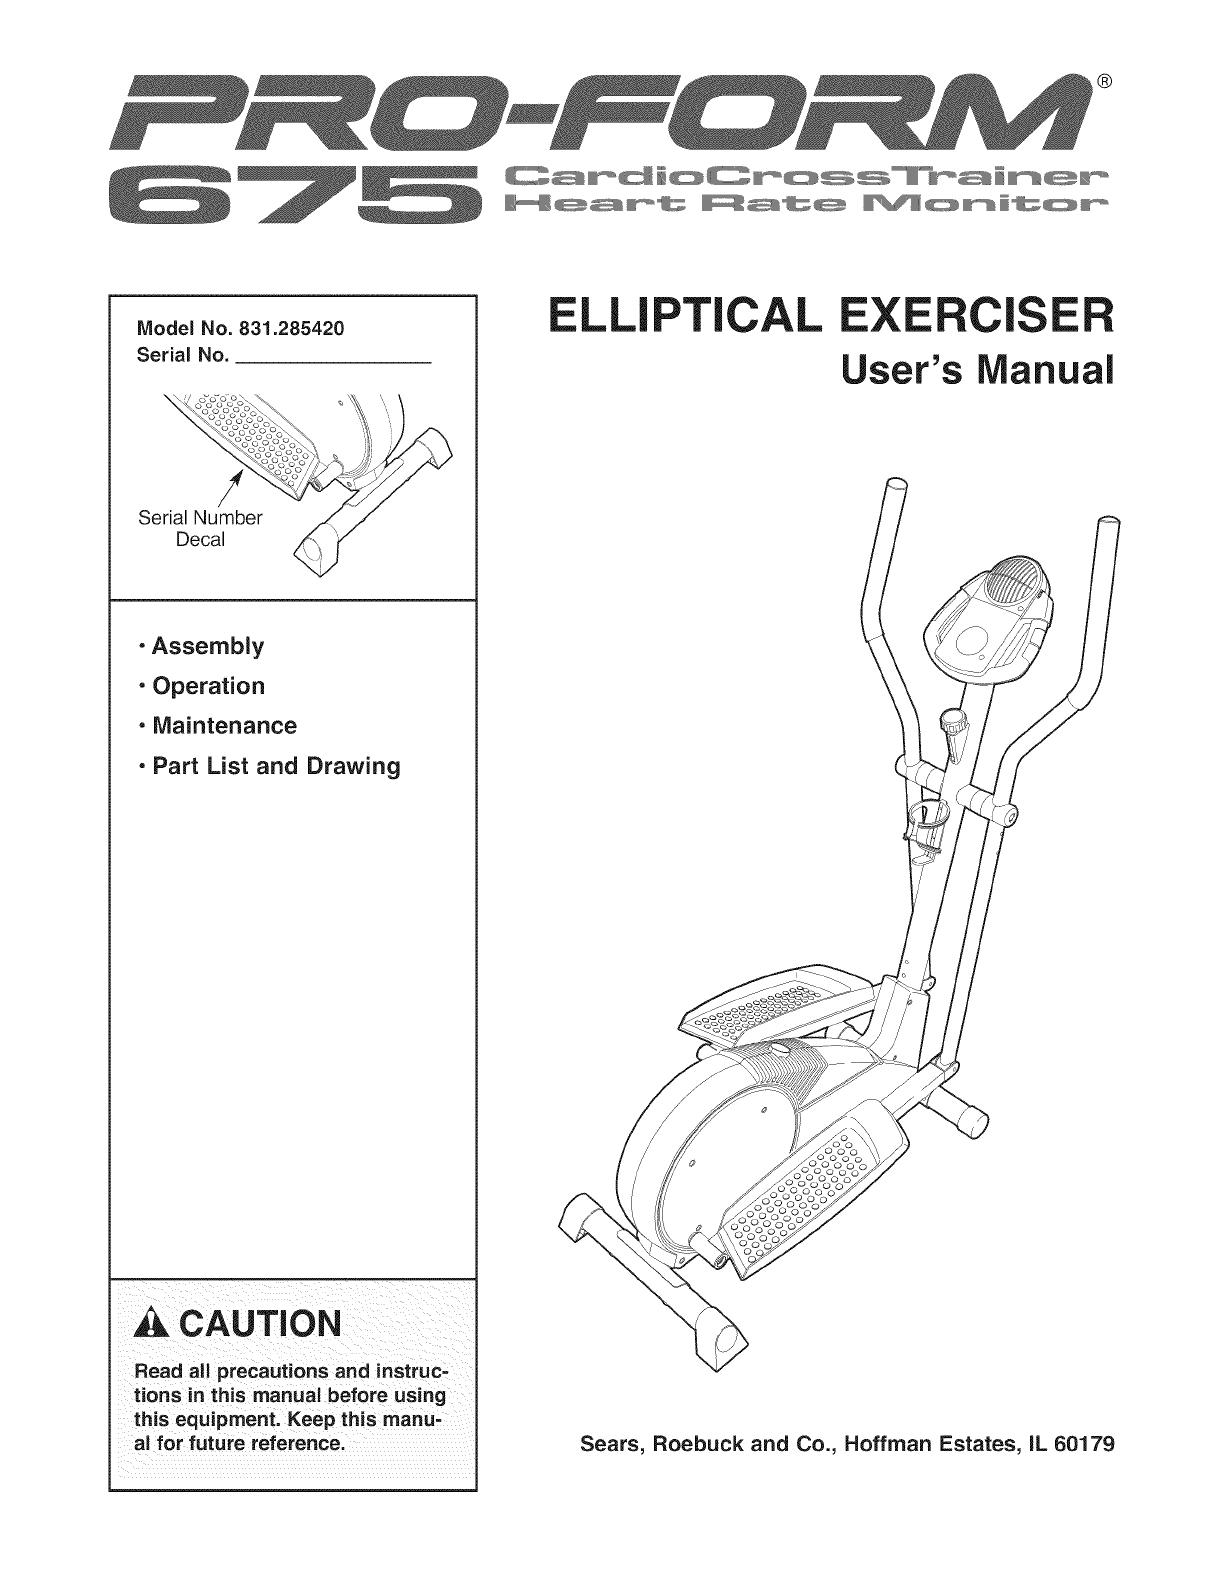 Proform 831285420 User Manual ELLIPTICAL Manuals And Guides